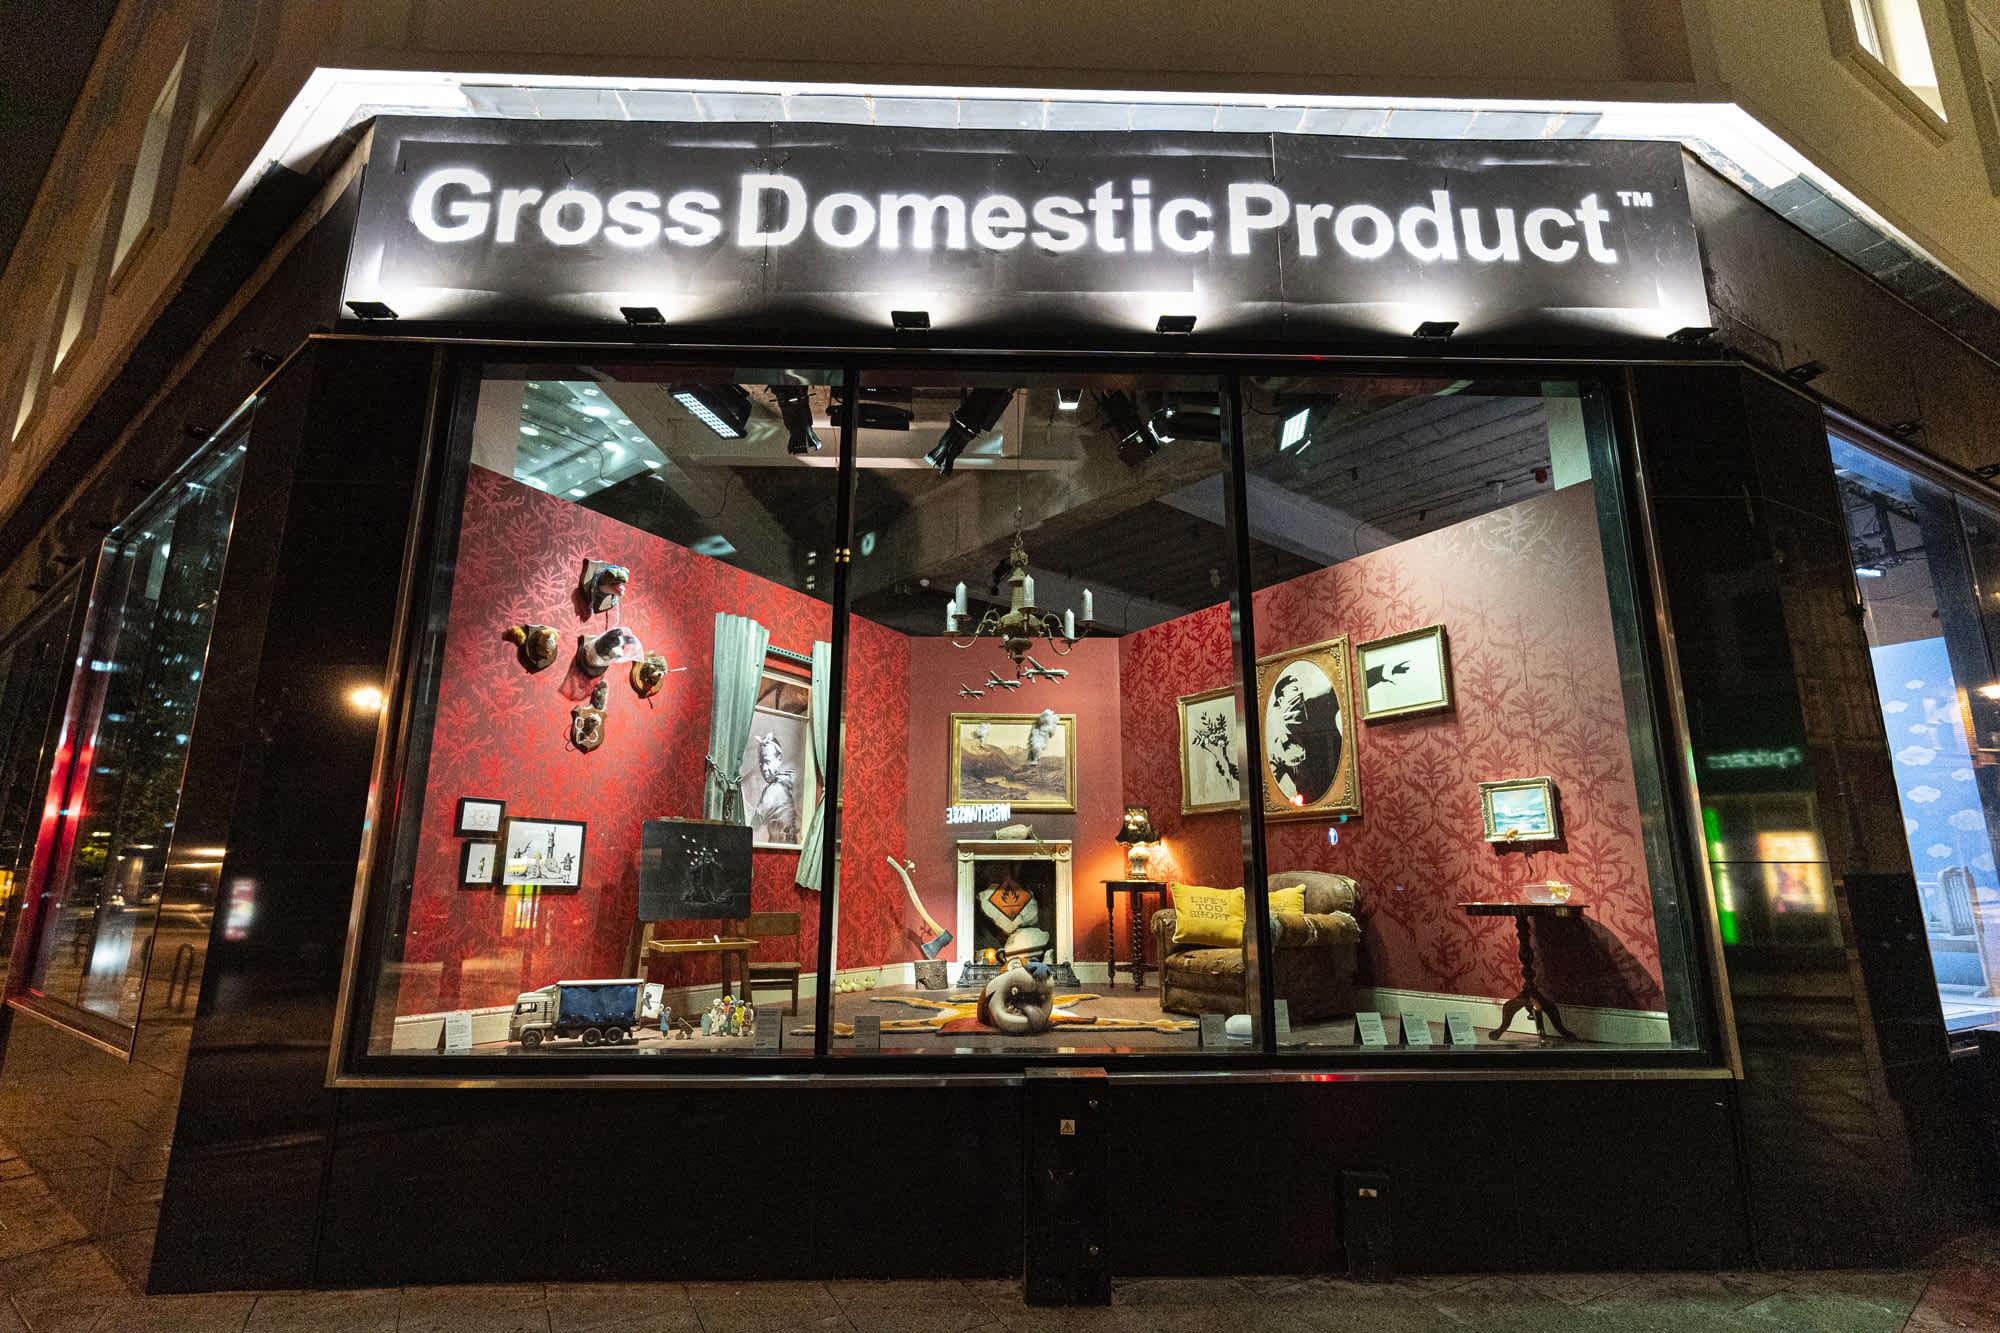 GrossDomesticProduct™ - Banksy Installation